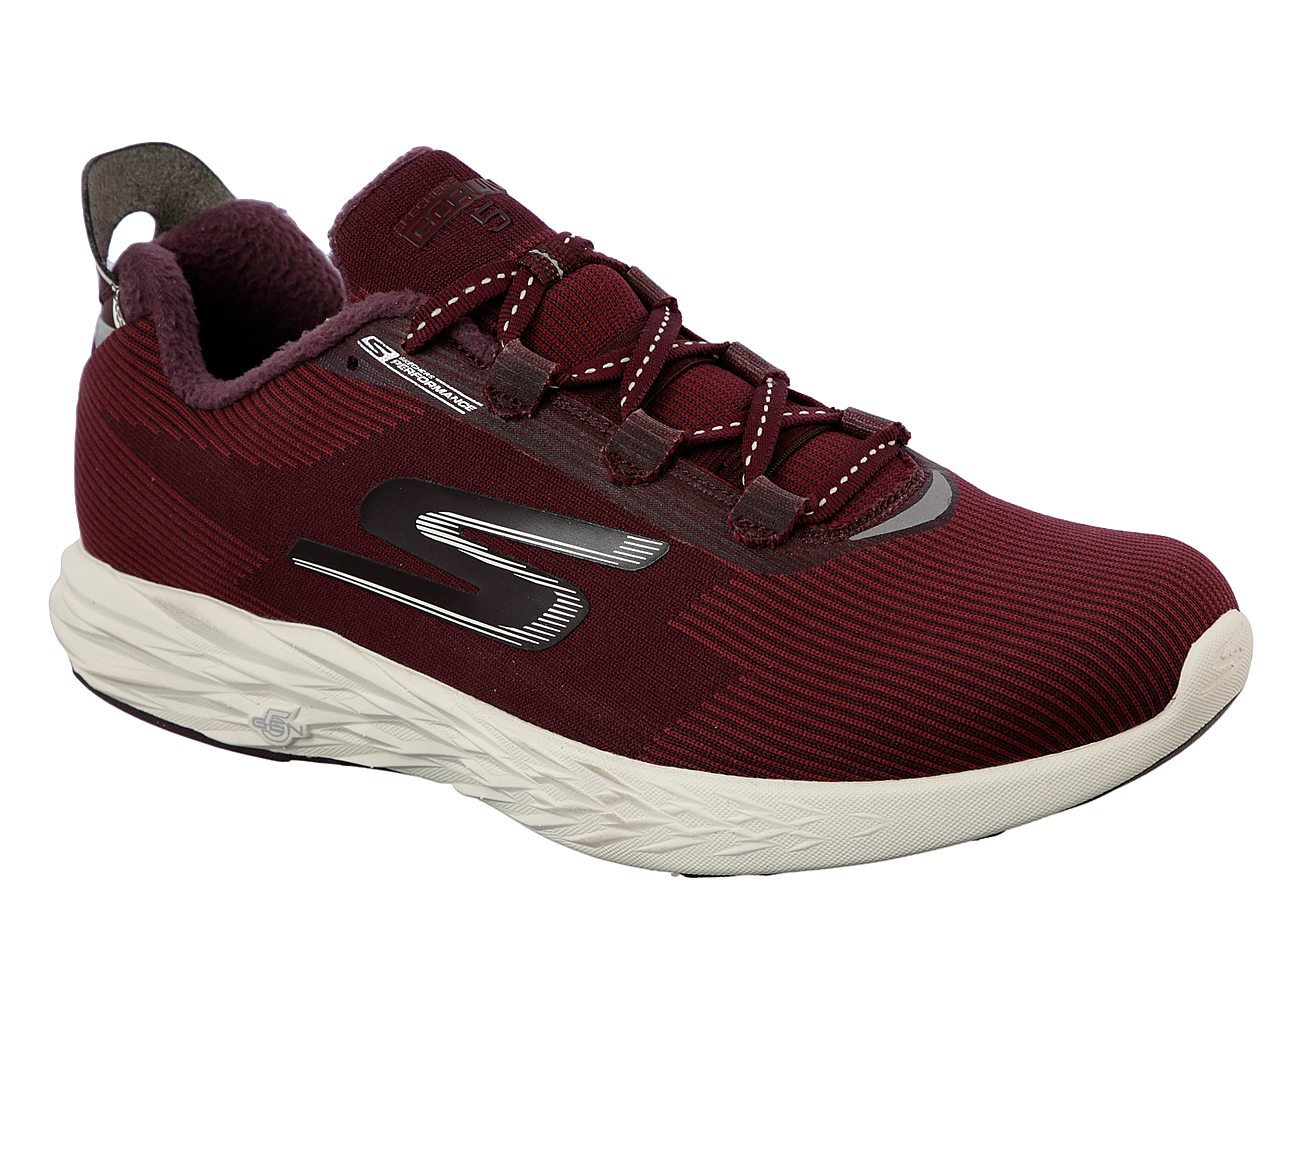 Skechers GOrun 5™ is the 5th generation in the Skechers